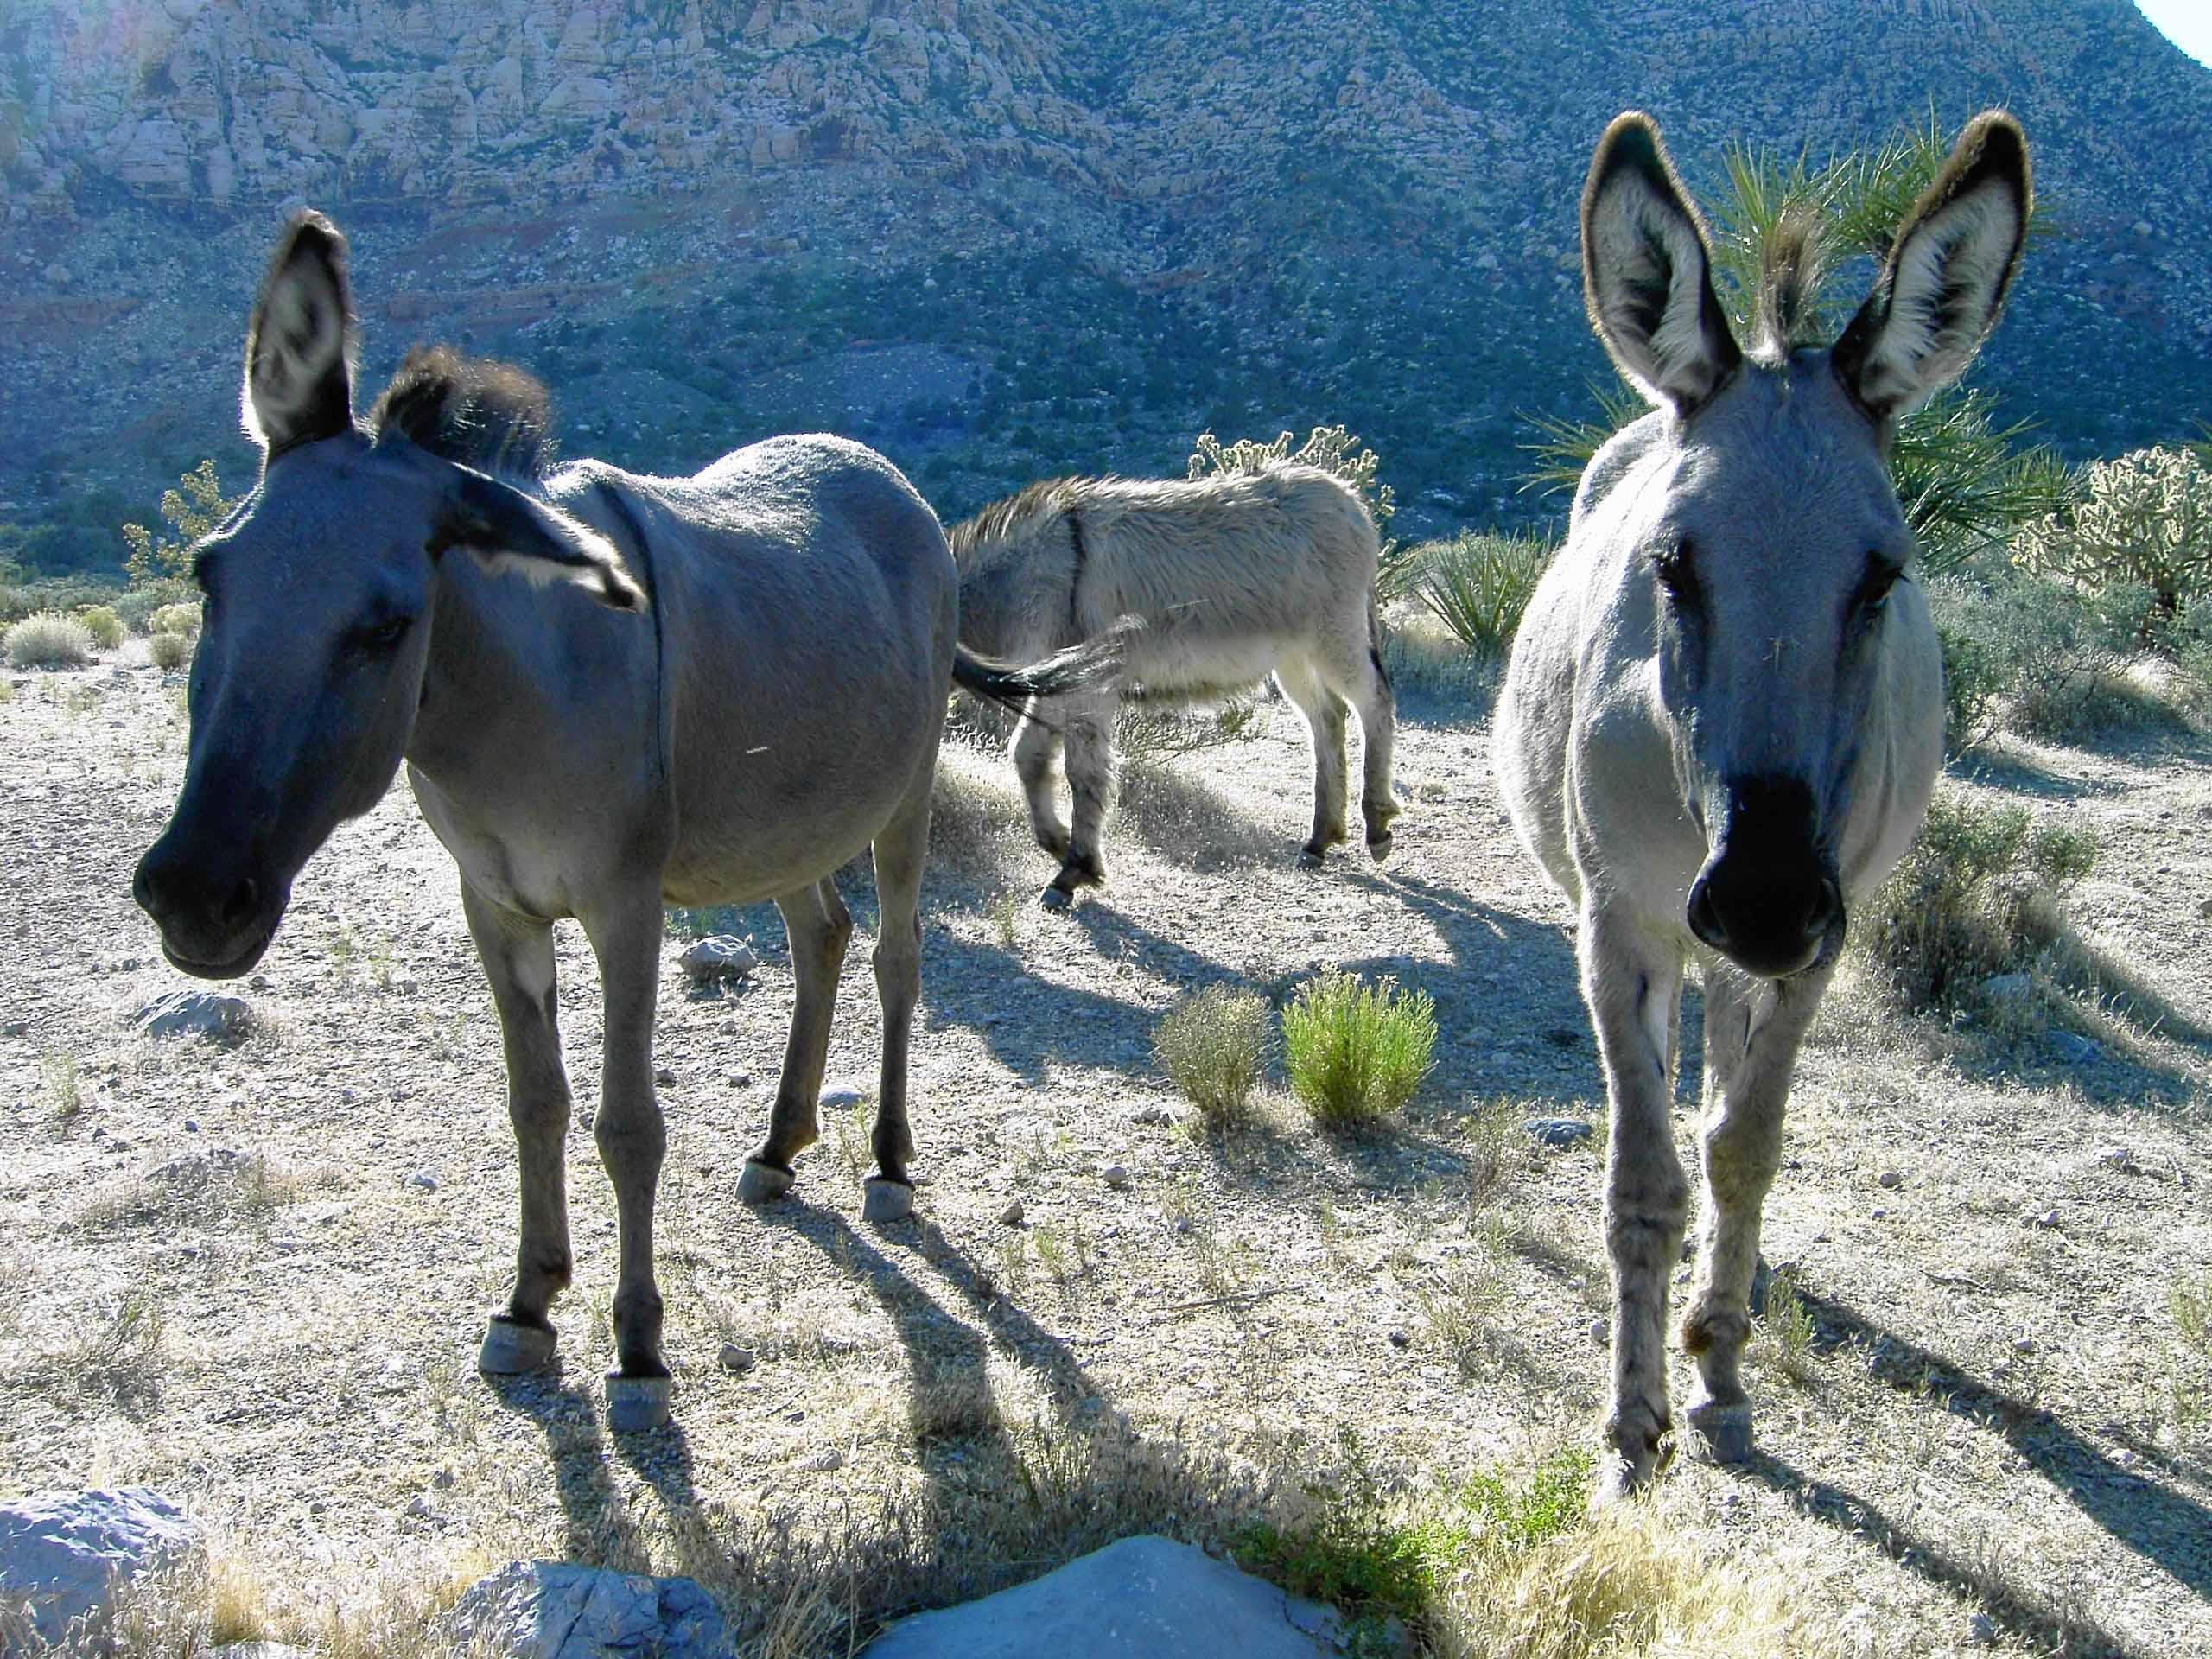 File:Wild Burros.jpg - Wikimedia Commons